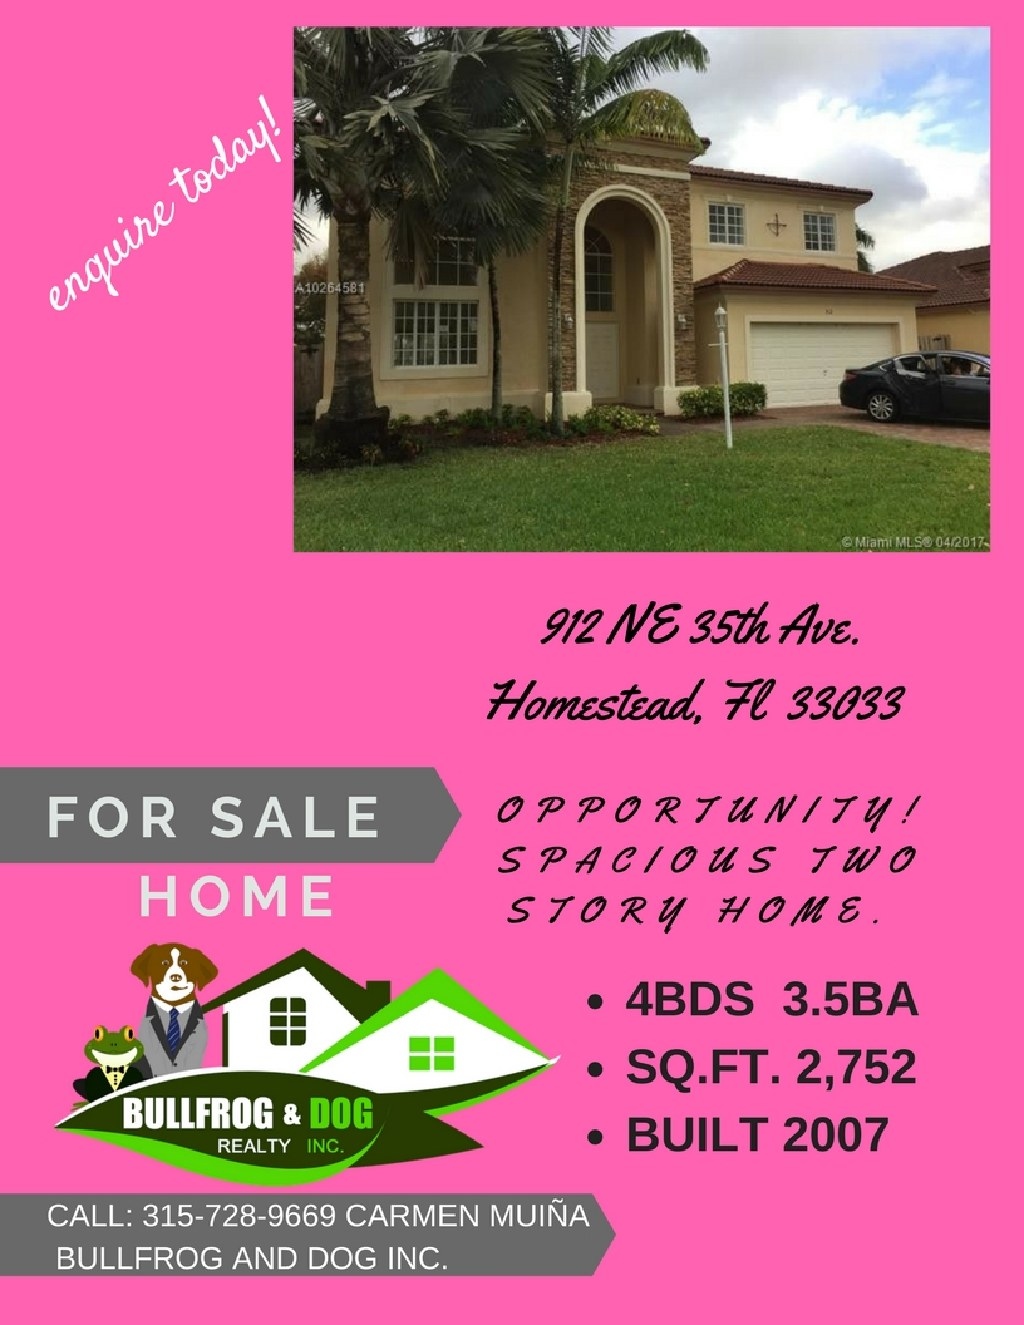 SINGLE FAMILY HOME 4/2. OPEN HOUSE